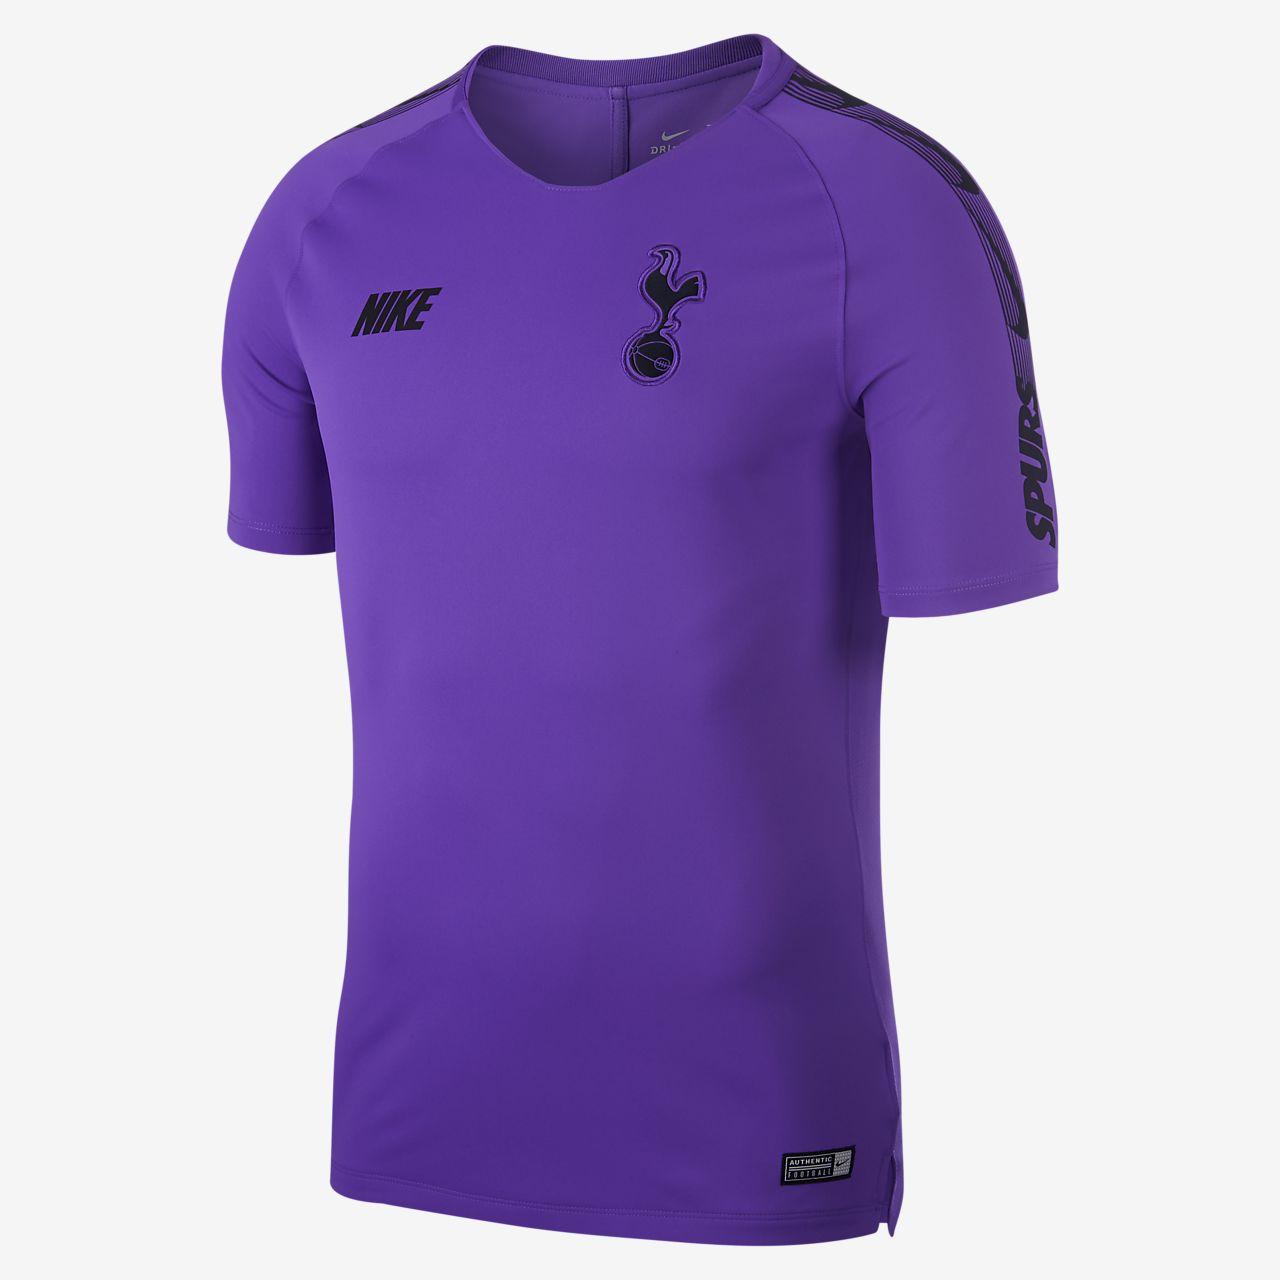 Nike Tottenham Hotspur Breathe Squad Football Top Hyper Grape Black Black Equipment Football Shirt Blog